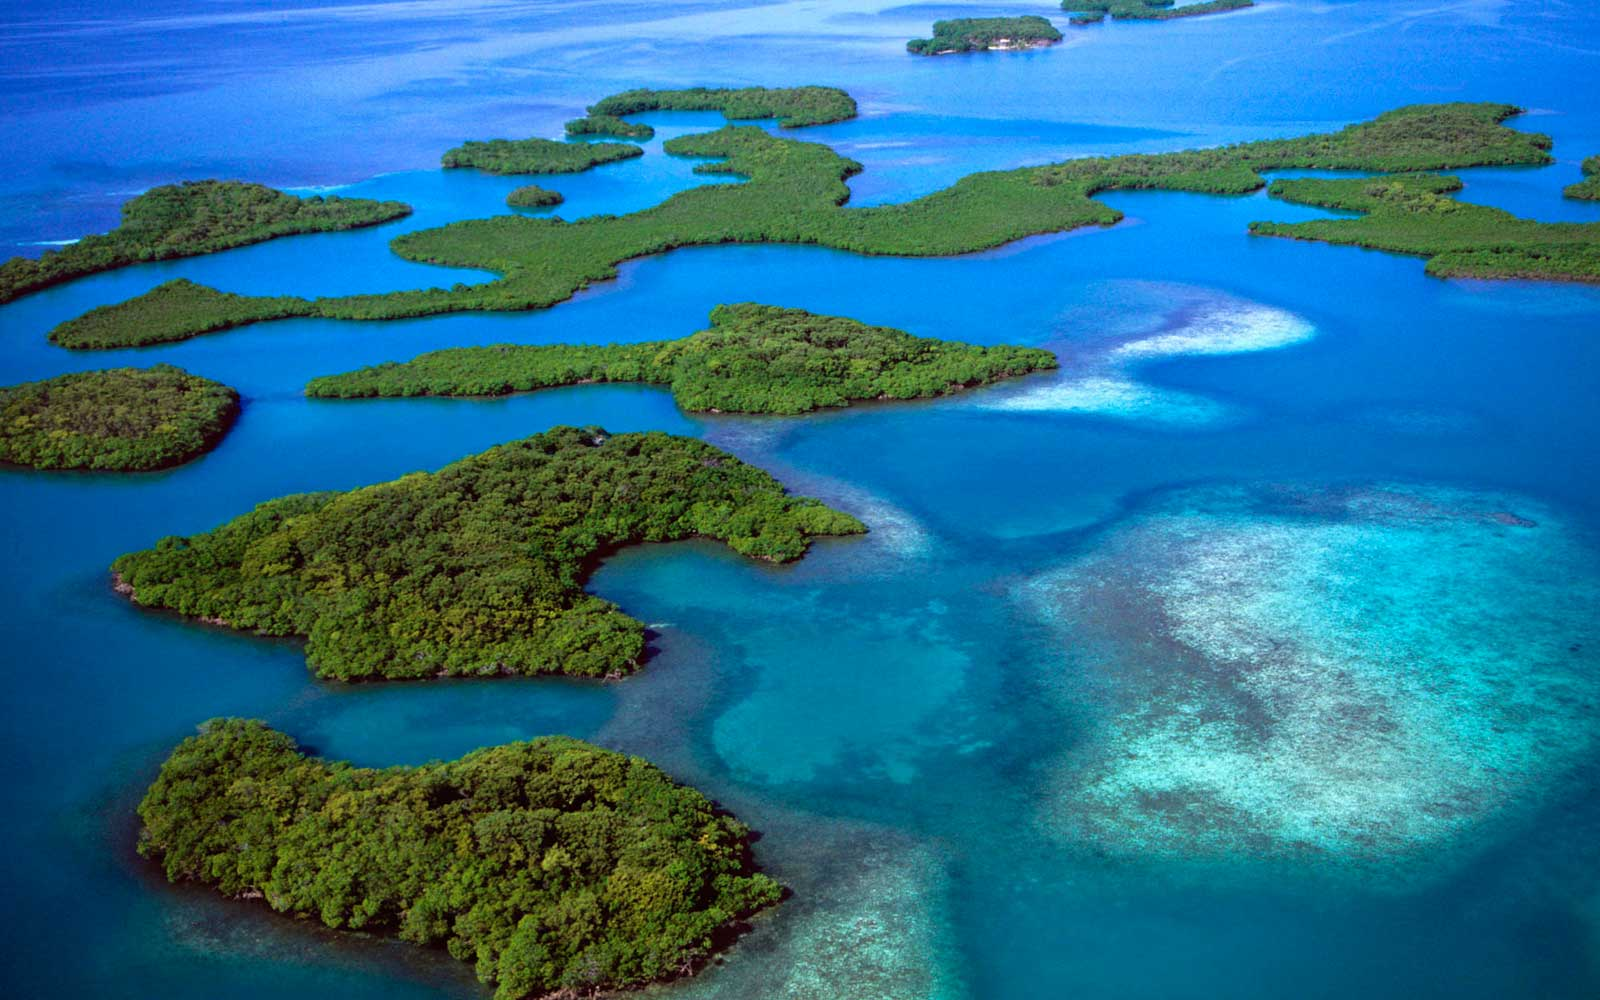 http://1.bp.blogspot.com/-kVvKXH_Aw6g/T5zqf9eX8kI/AAAAAAAAHpM/XOmu-NVbJYw/s1600/Amazing+Island_Wallpaper.jpg